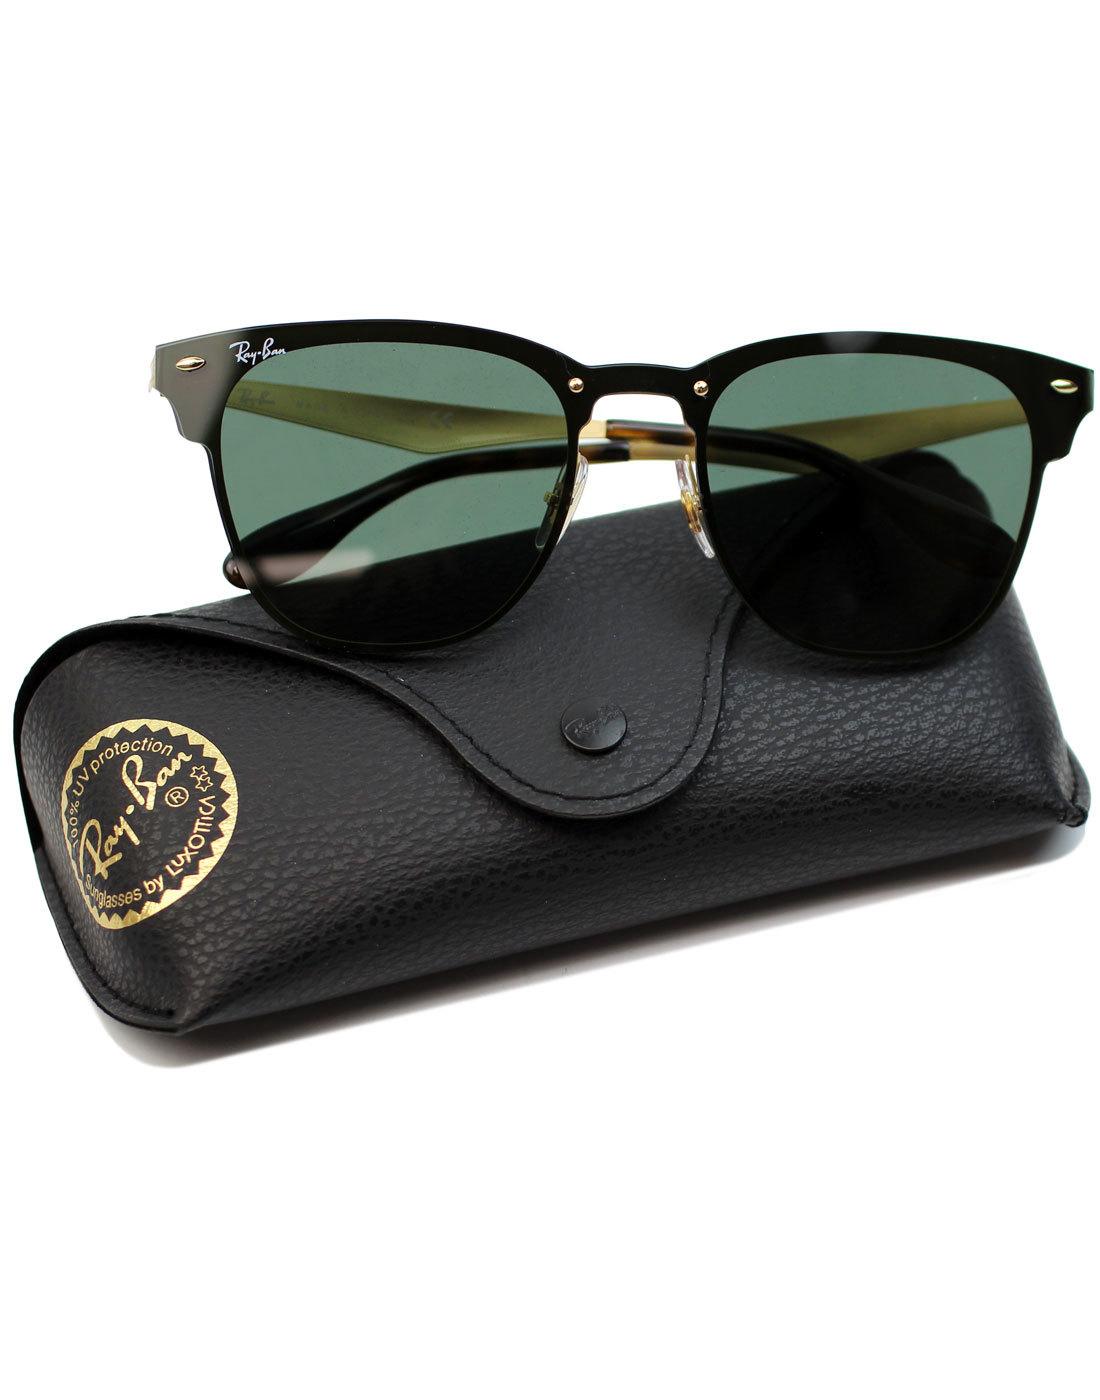 6be3253835 RAY-BAN Blaze Shooter Retro 70s Aviator Sunglasses in Gold Black